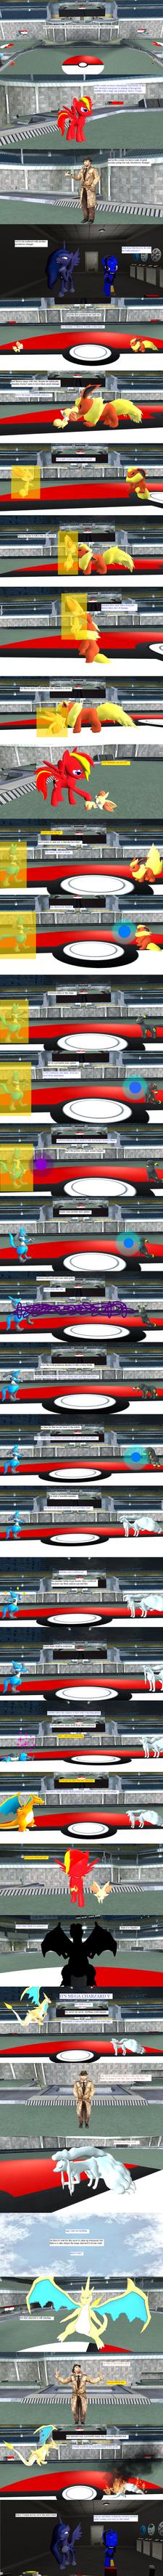 pokemon tournament Heavy Torque vs Mysterious by kxp71